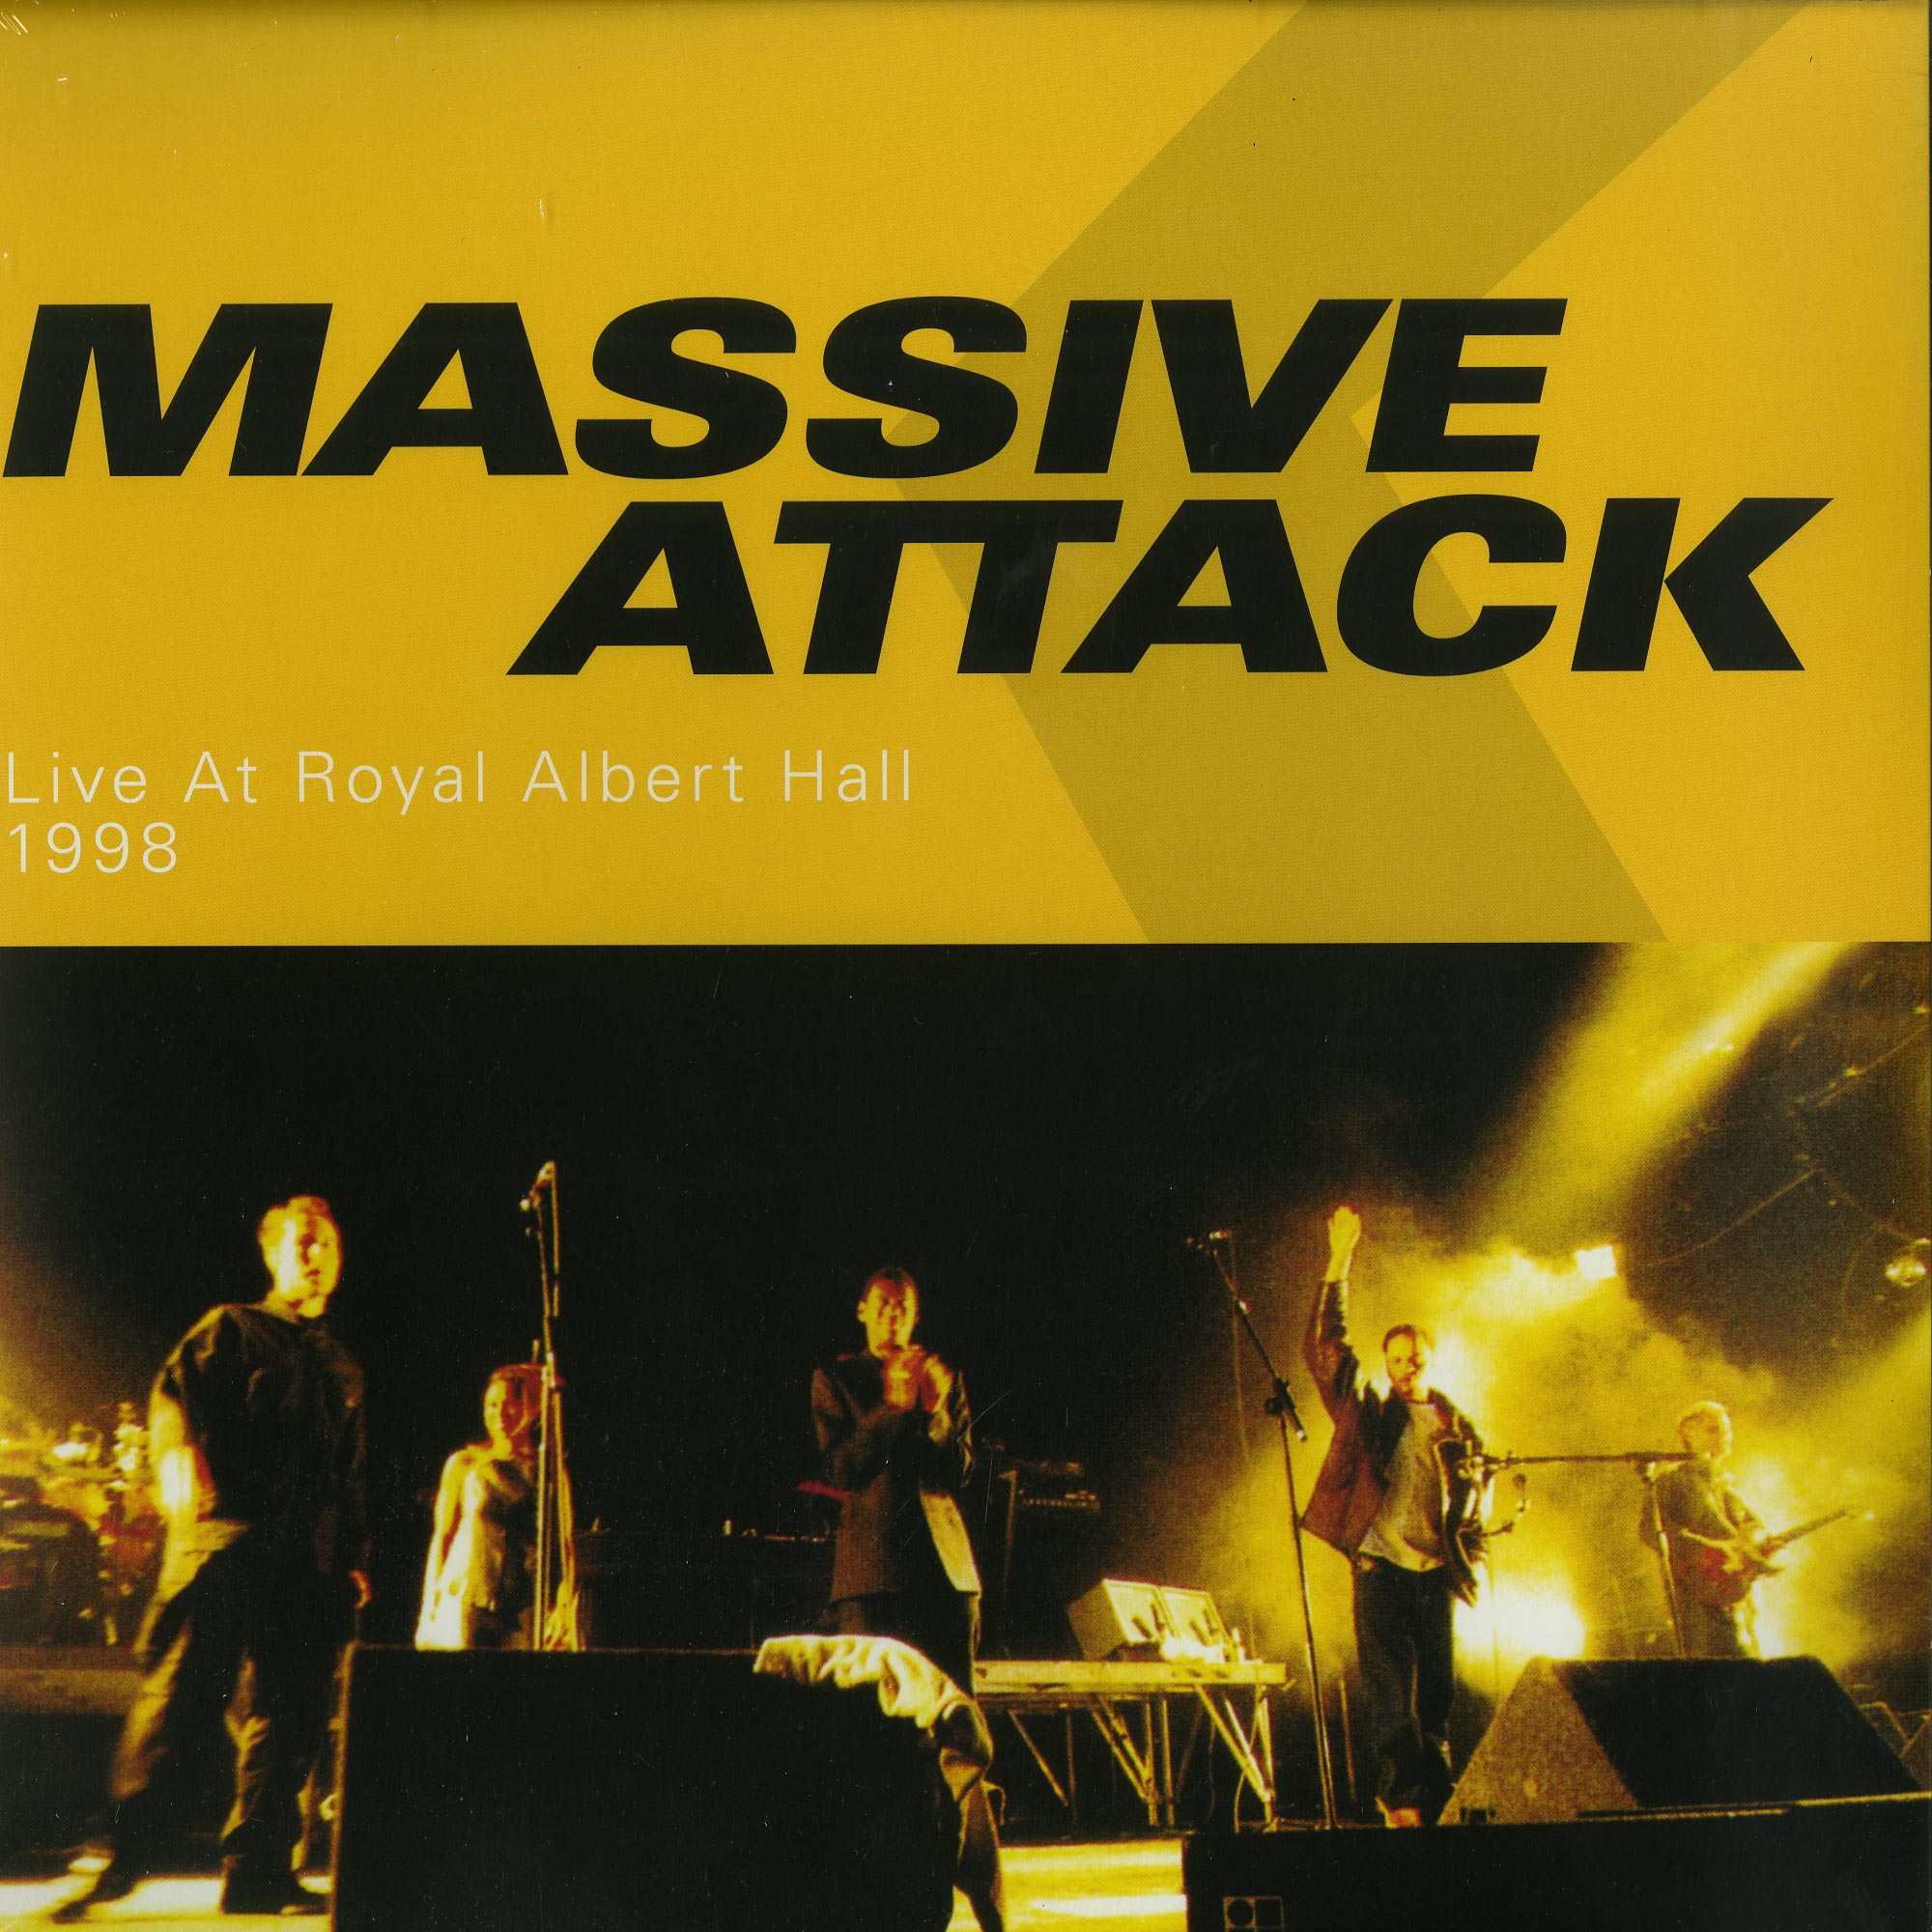 Massive Attack - LIVE AT THE ROYAL ALBERT HALL